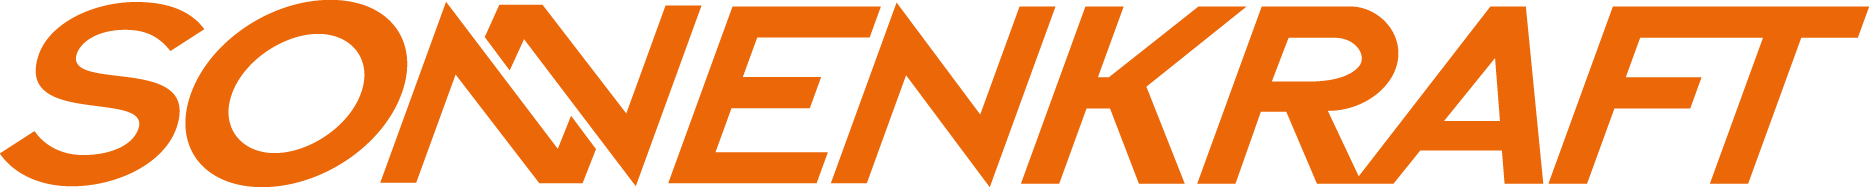 SONNENKRAFT GmbH